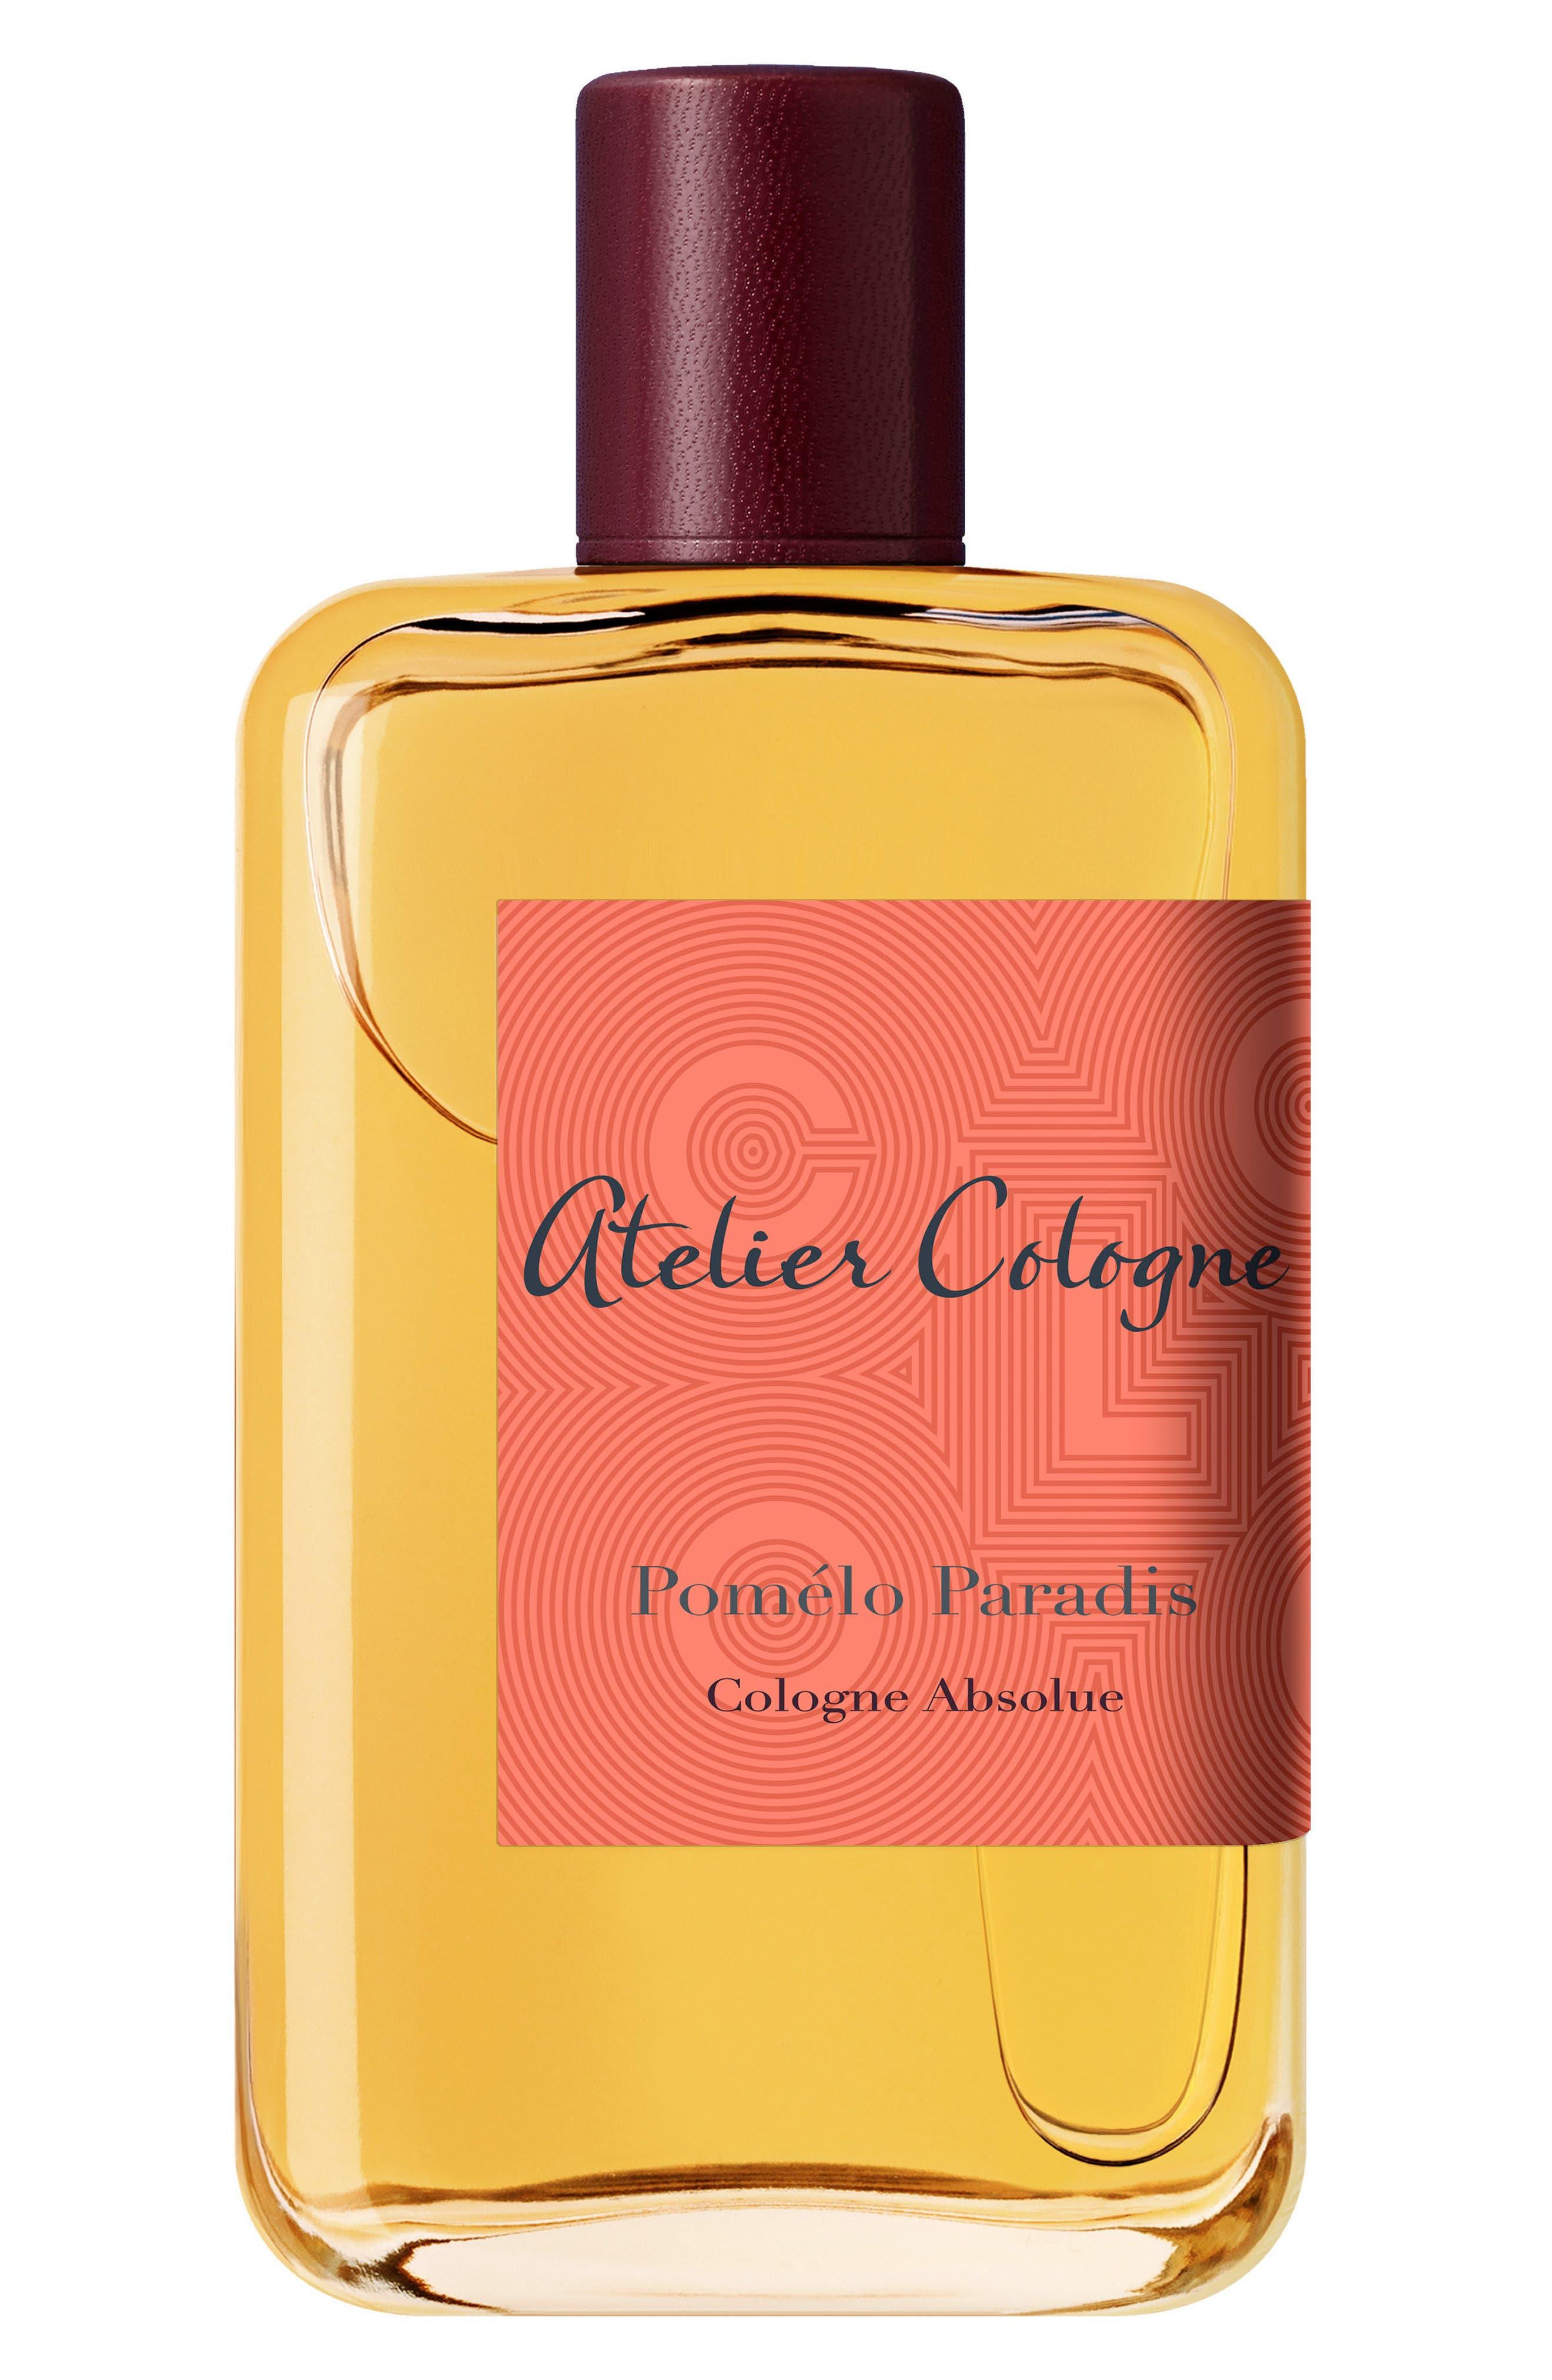 Alternate Image 1 Selected - Atelier Cologne Pomélo Paradis Cologne Absolue